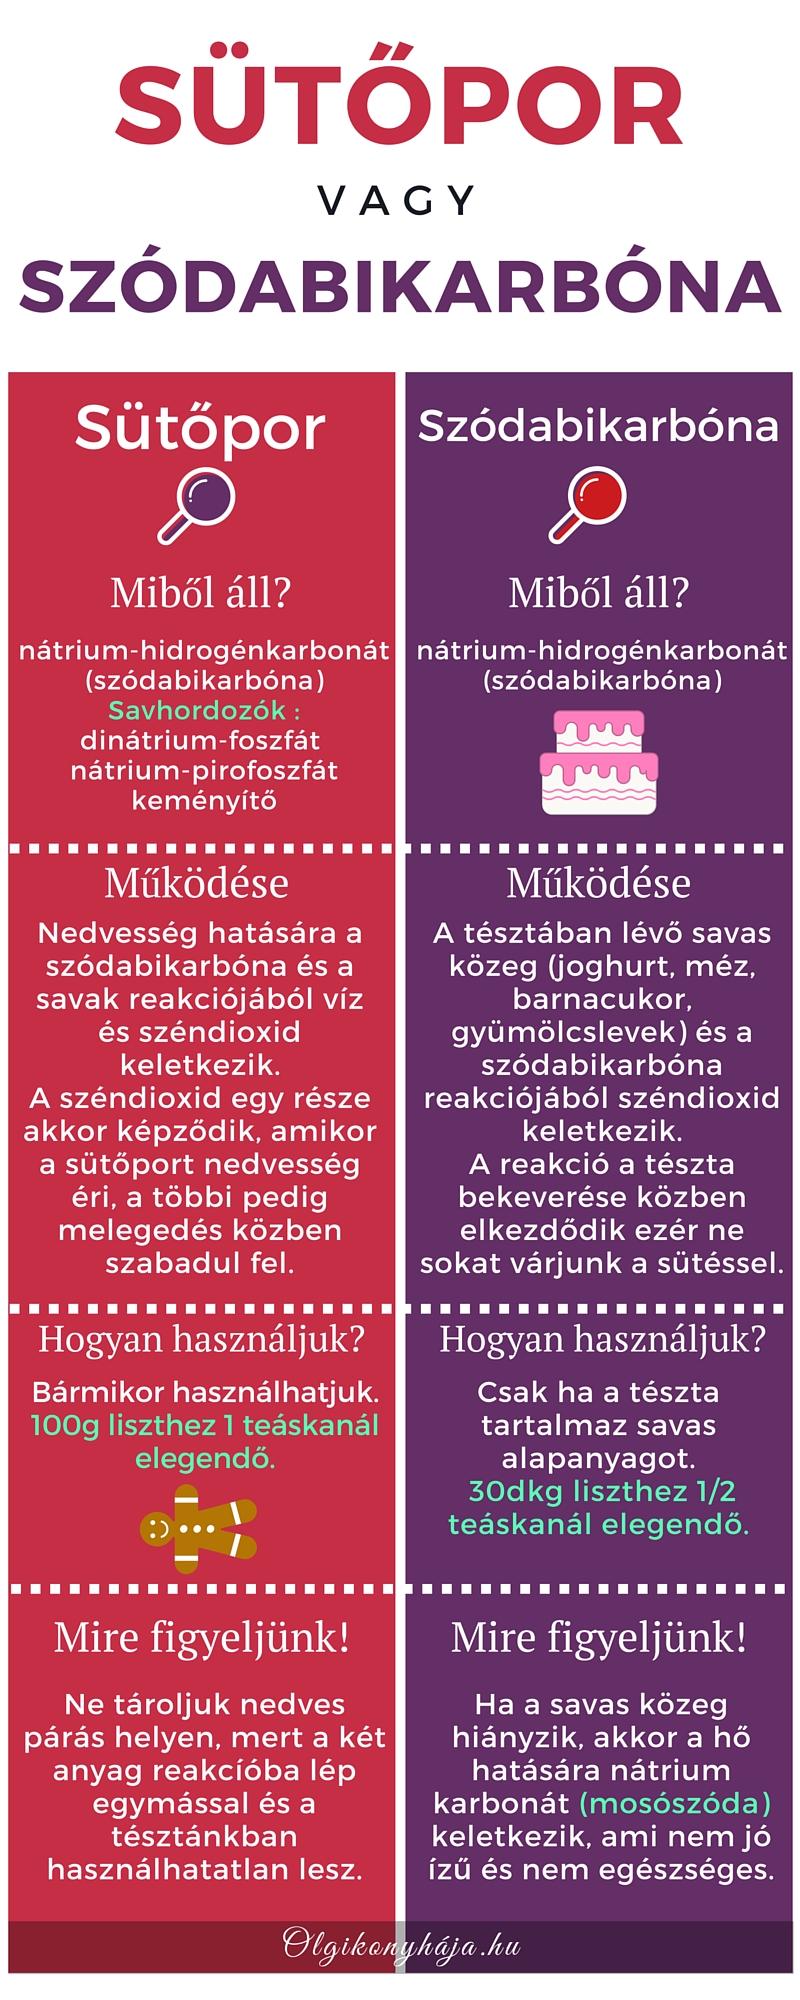 Sutopor-helyett-szodabikarbona-info